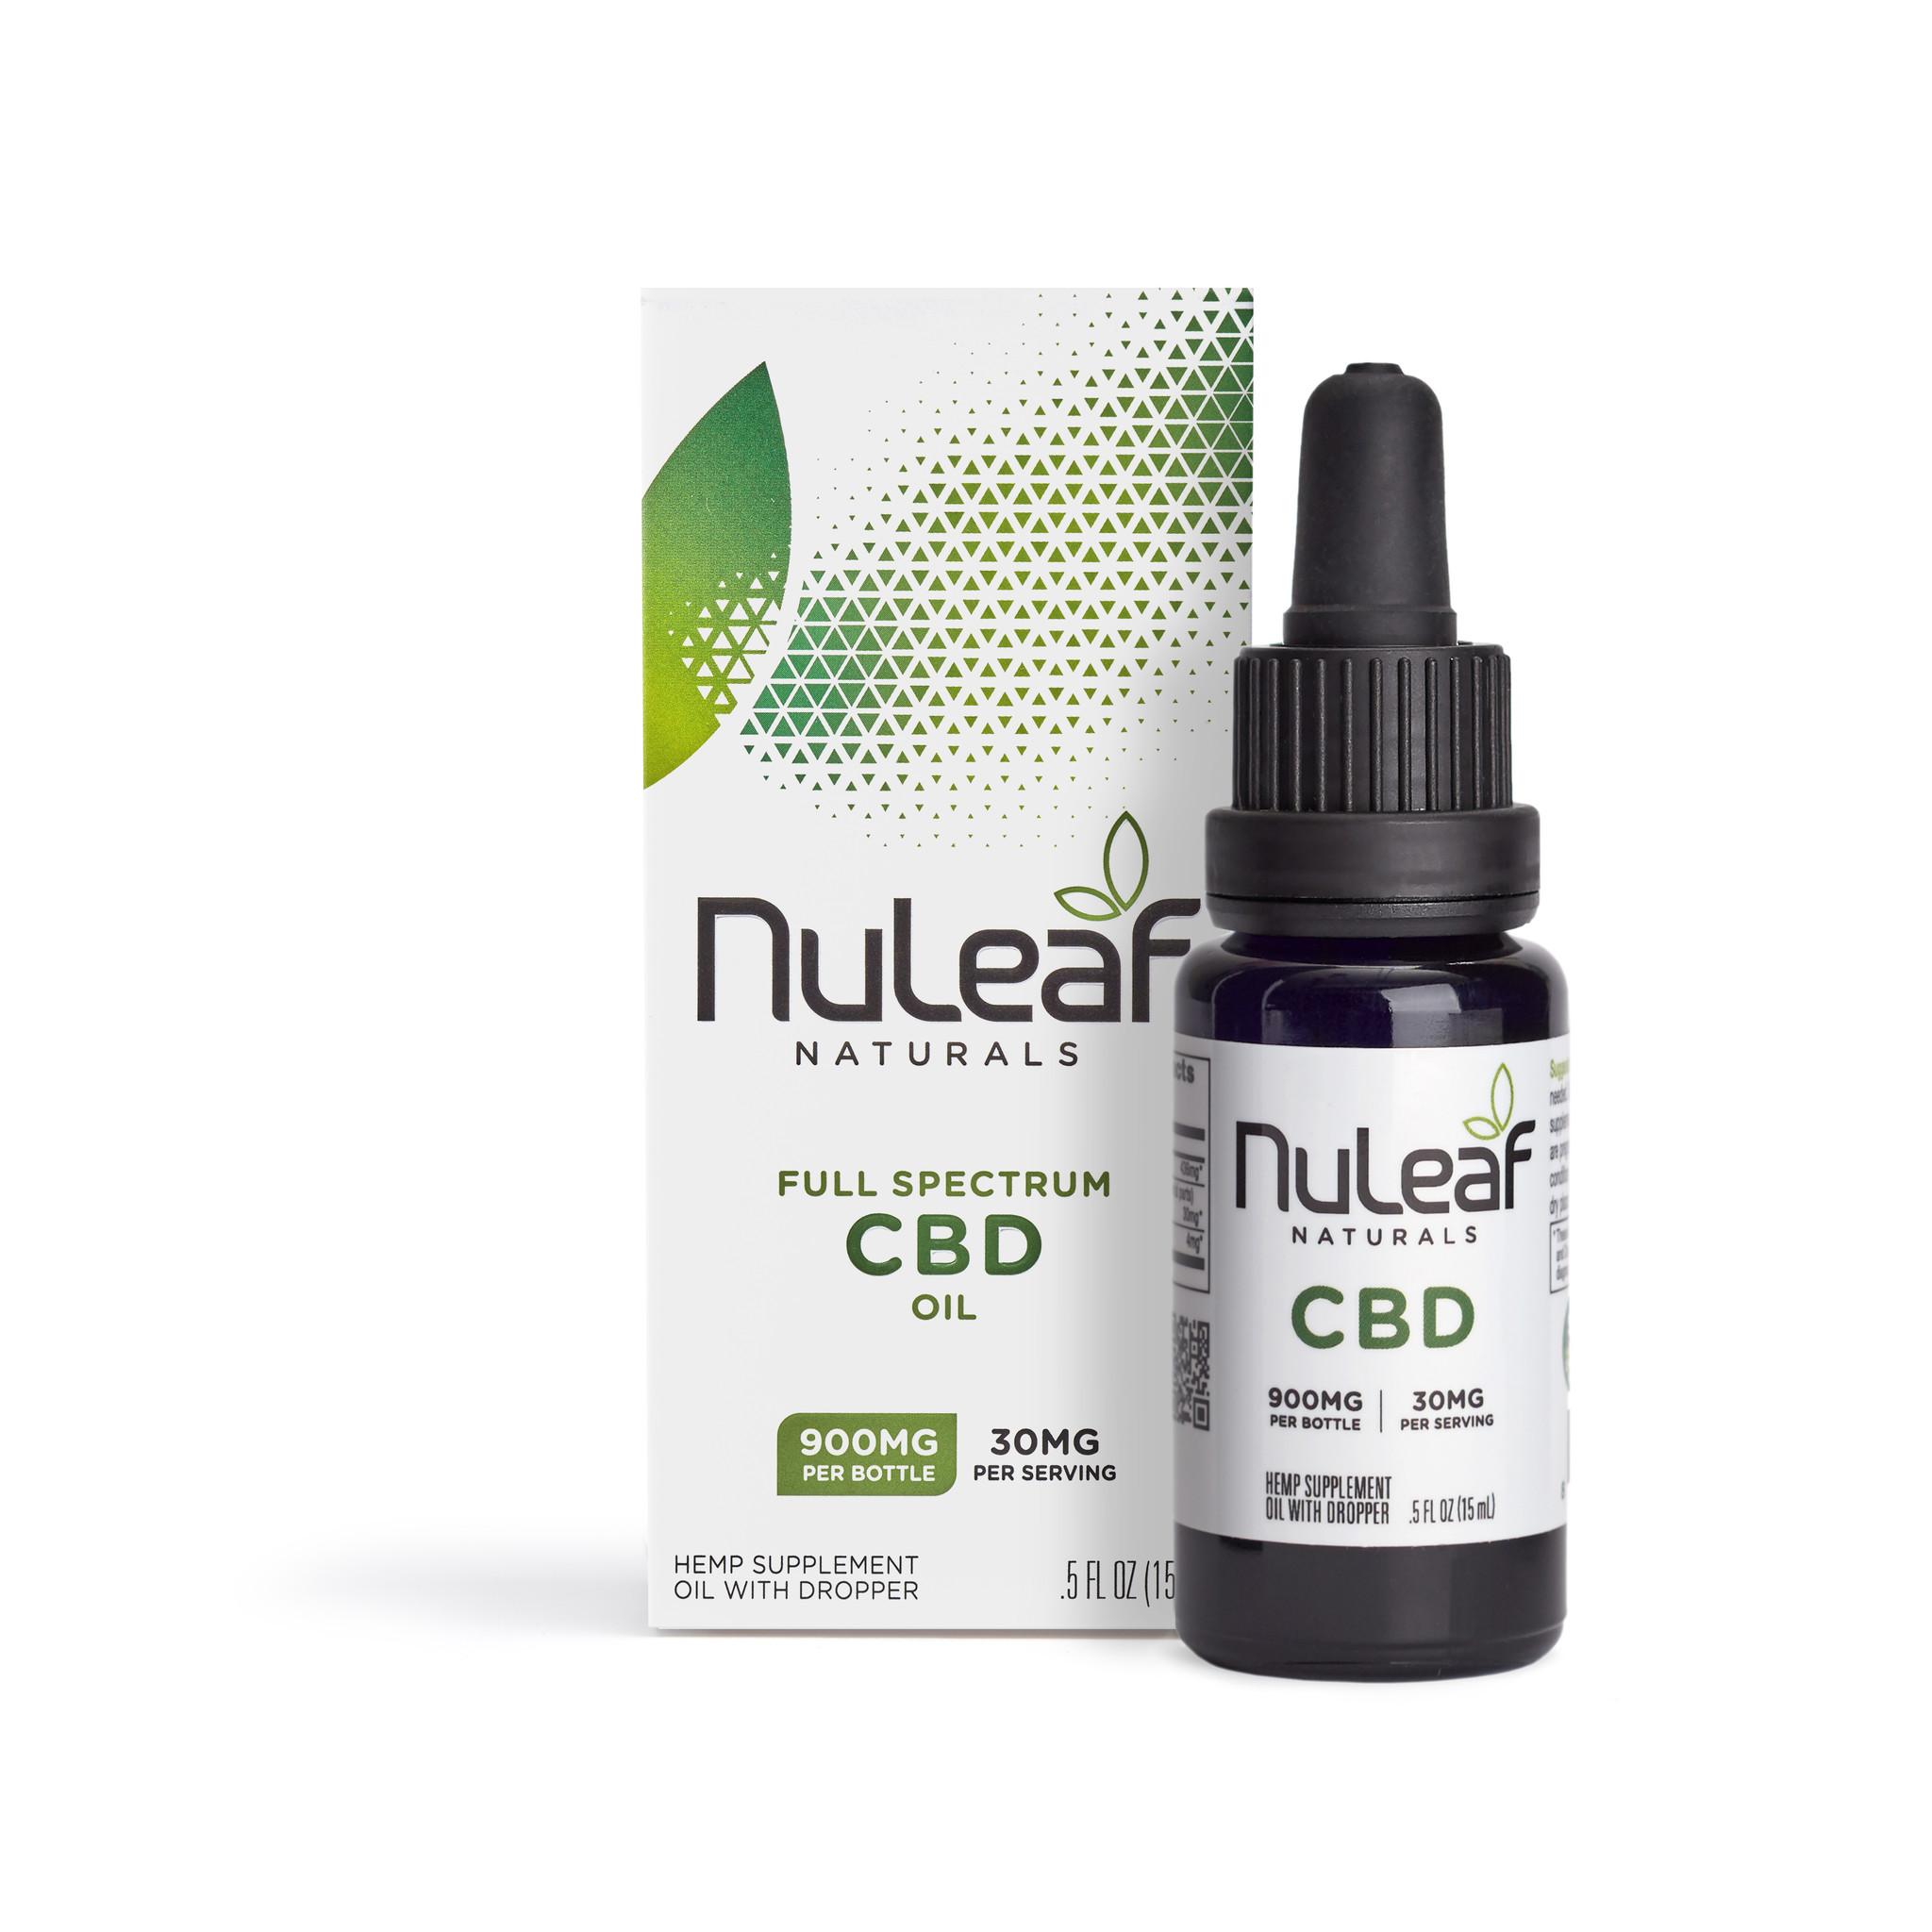 NuLeaf Naturals FULL SPECTRUM CBD OIL | HIGH GRADE HEMP EXTRACT | 900mg | 60mg per ml | 15ml Bottle